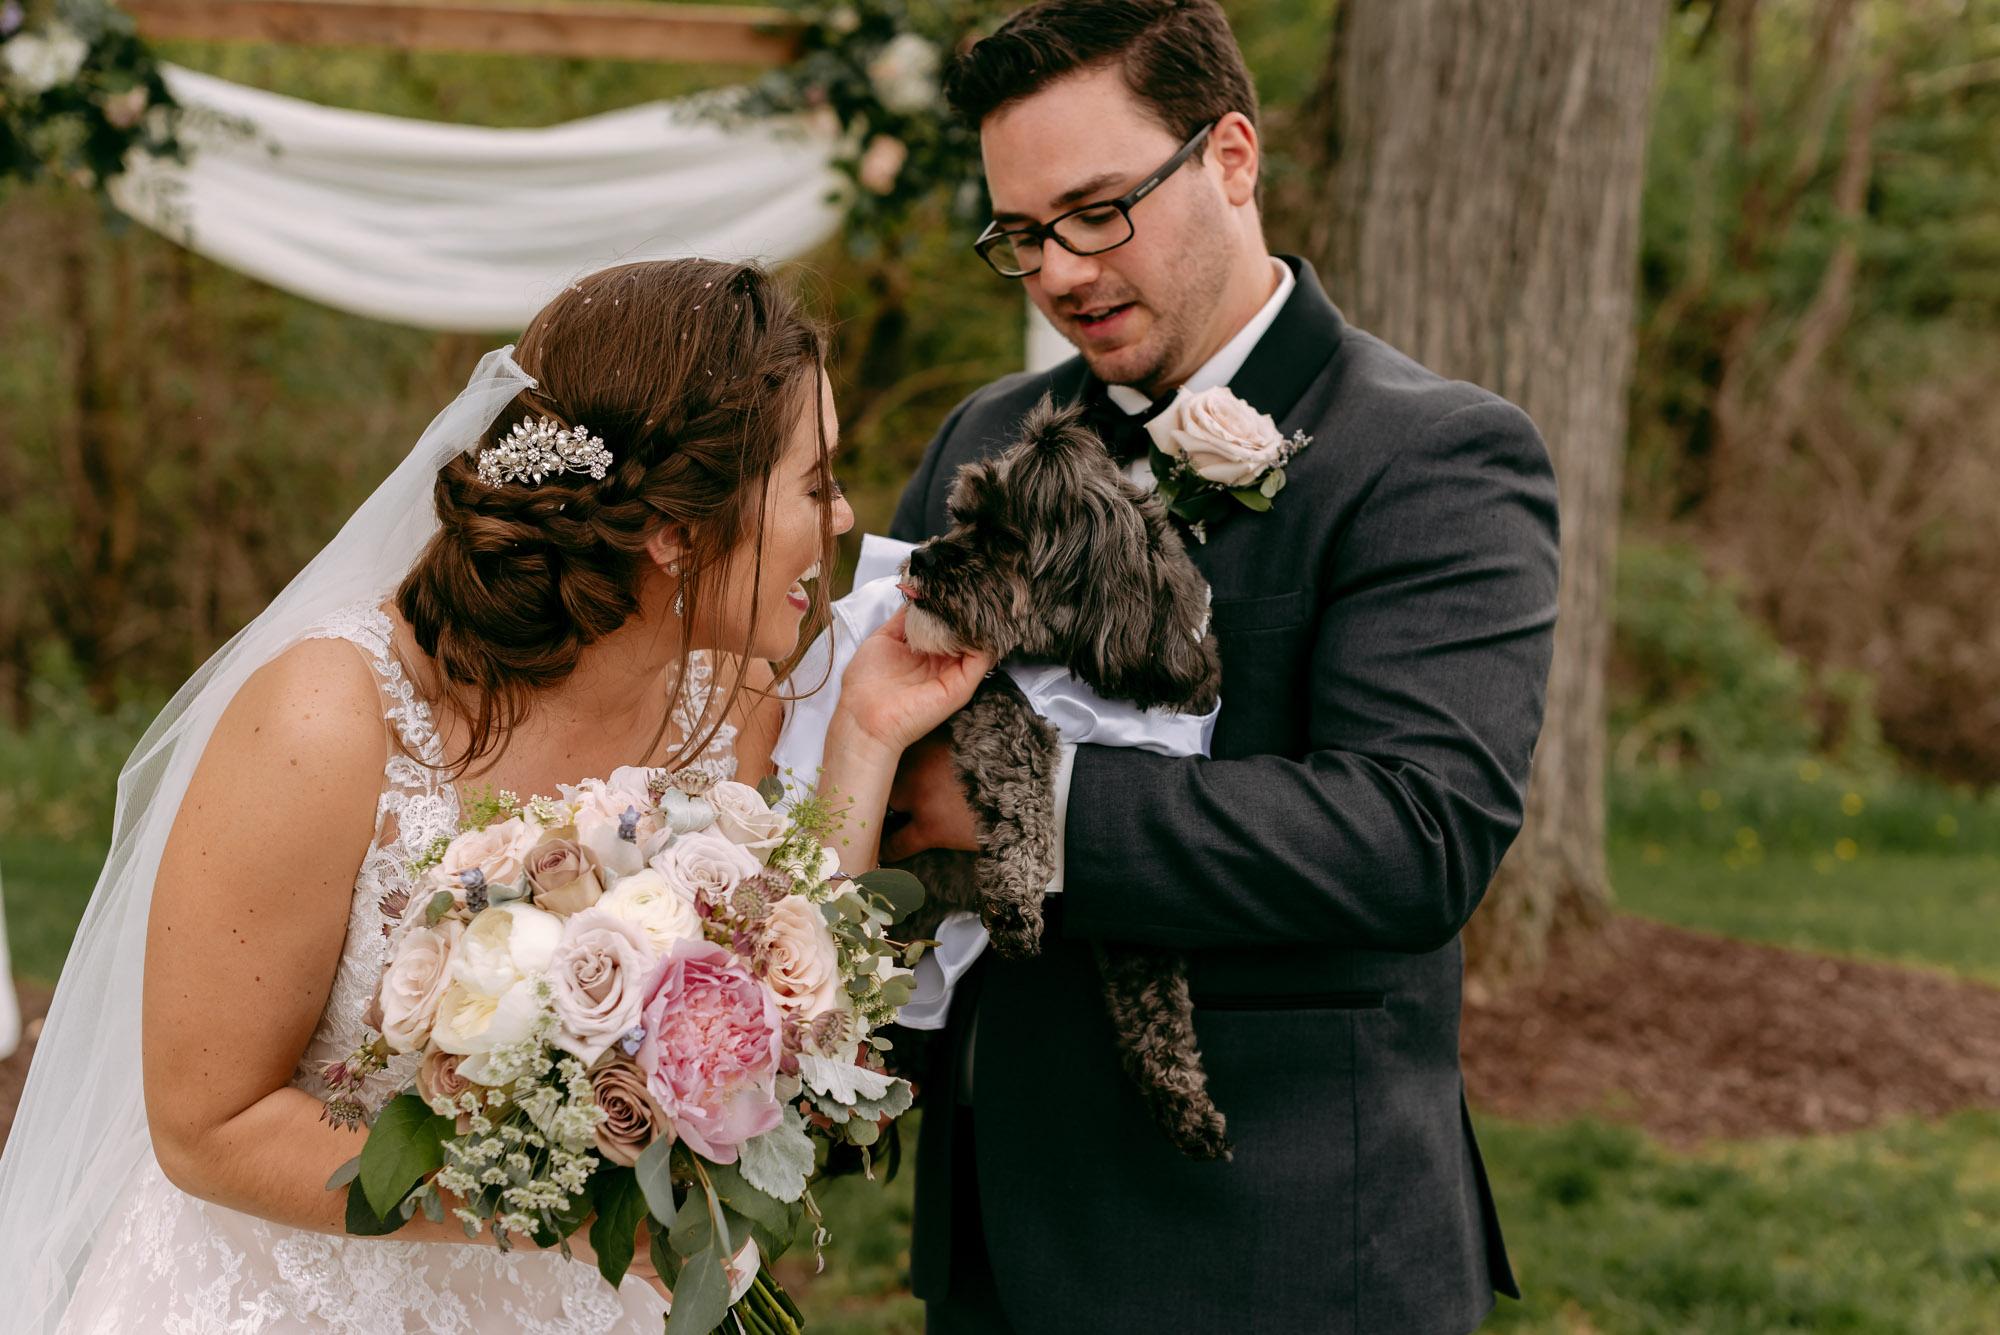 orchard-farms-pavillion-wedding-rockton-IL-wedding-photographers-306.jpg